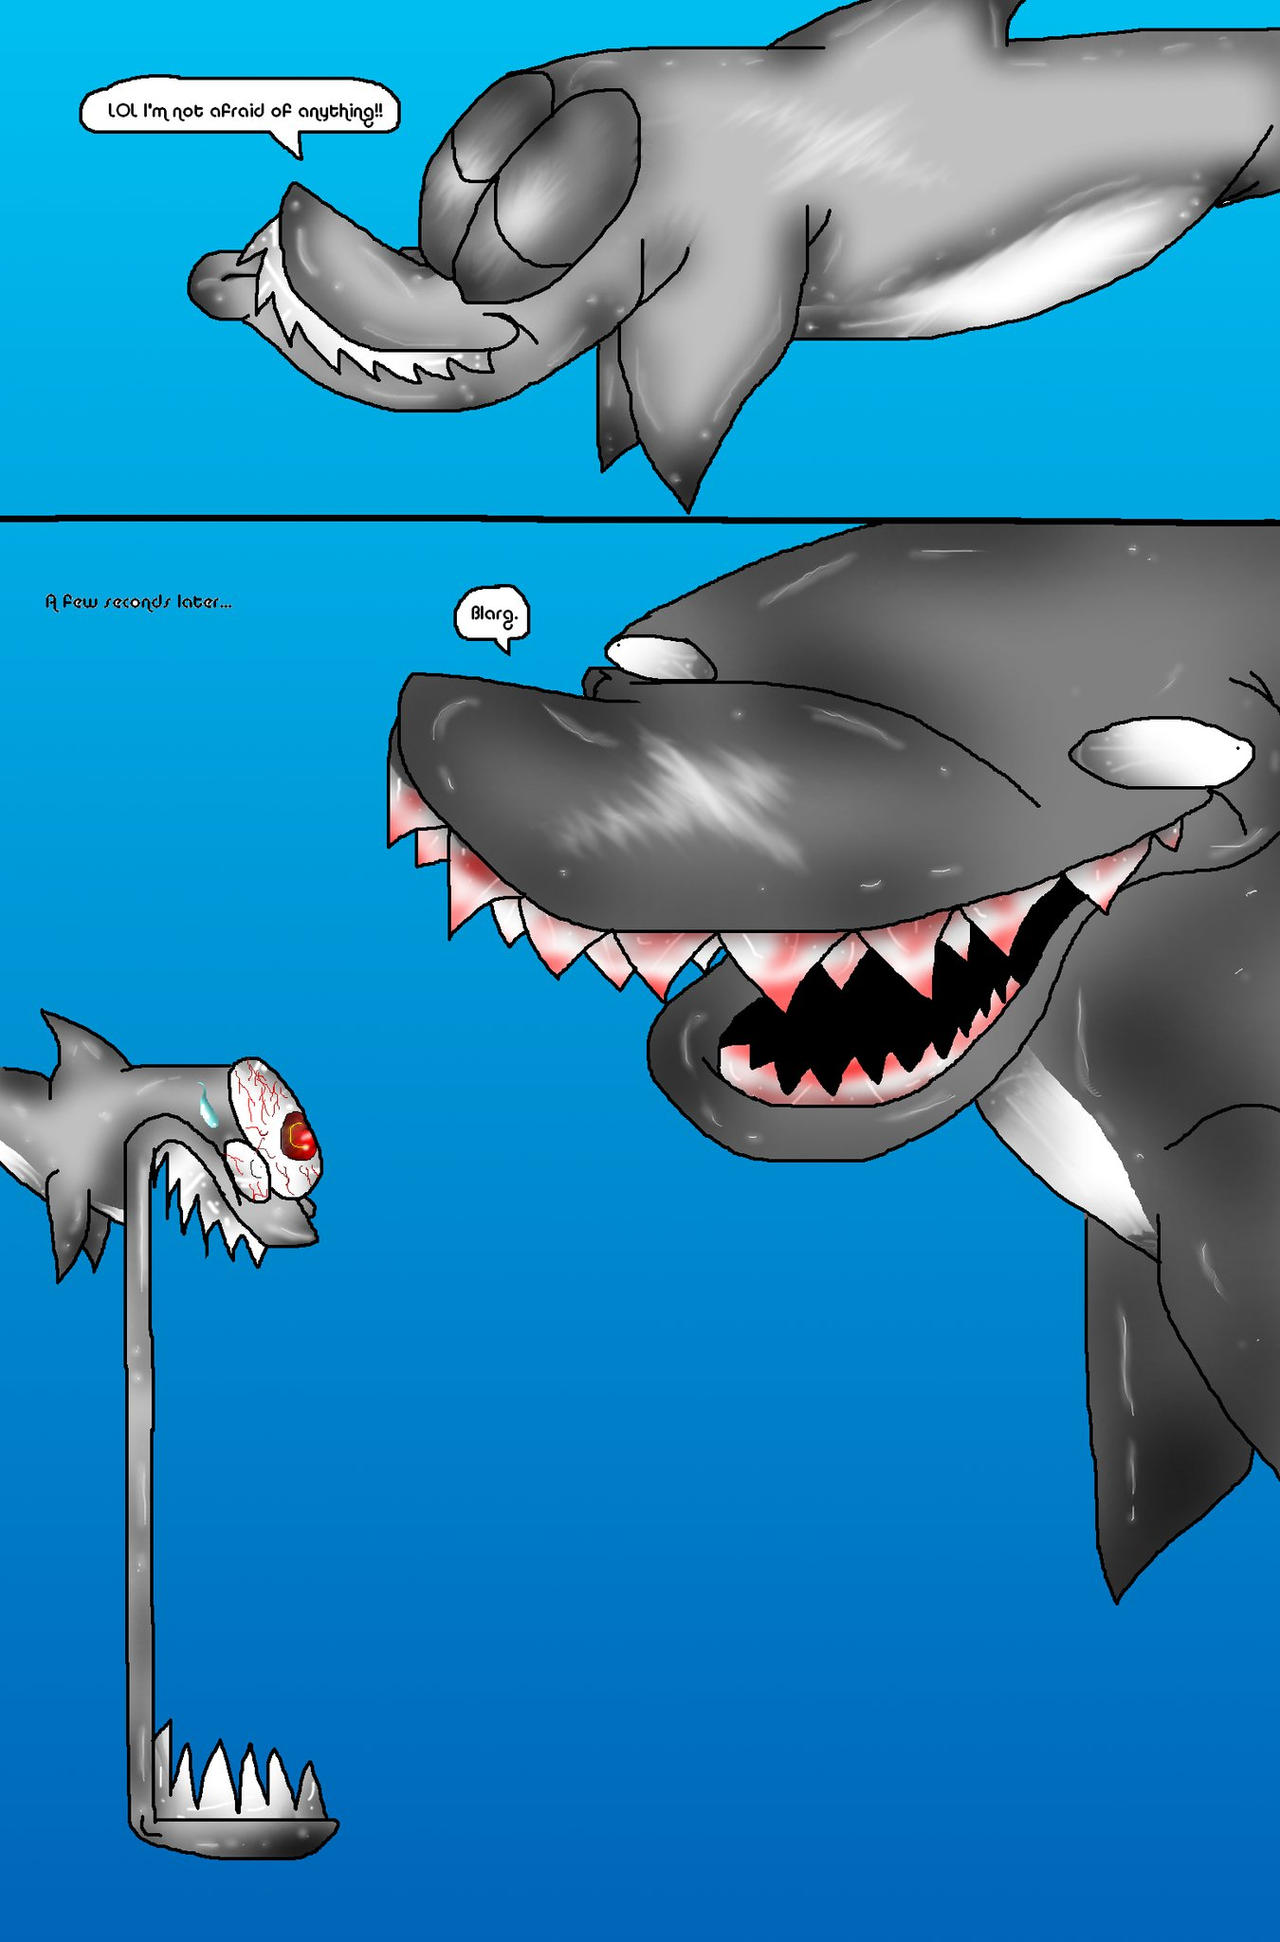 Megalodon shark jaw size